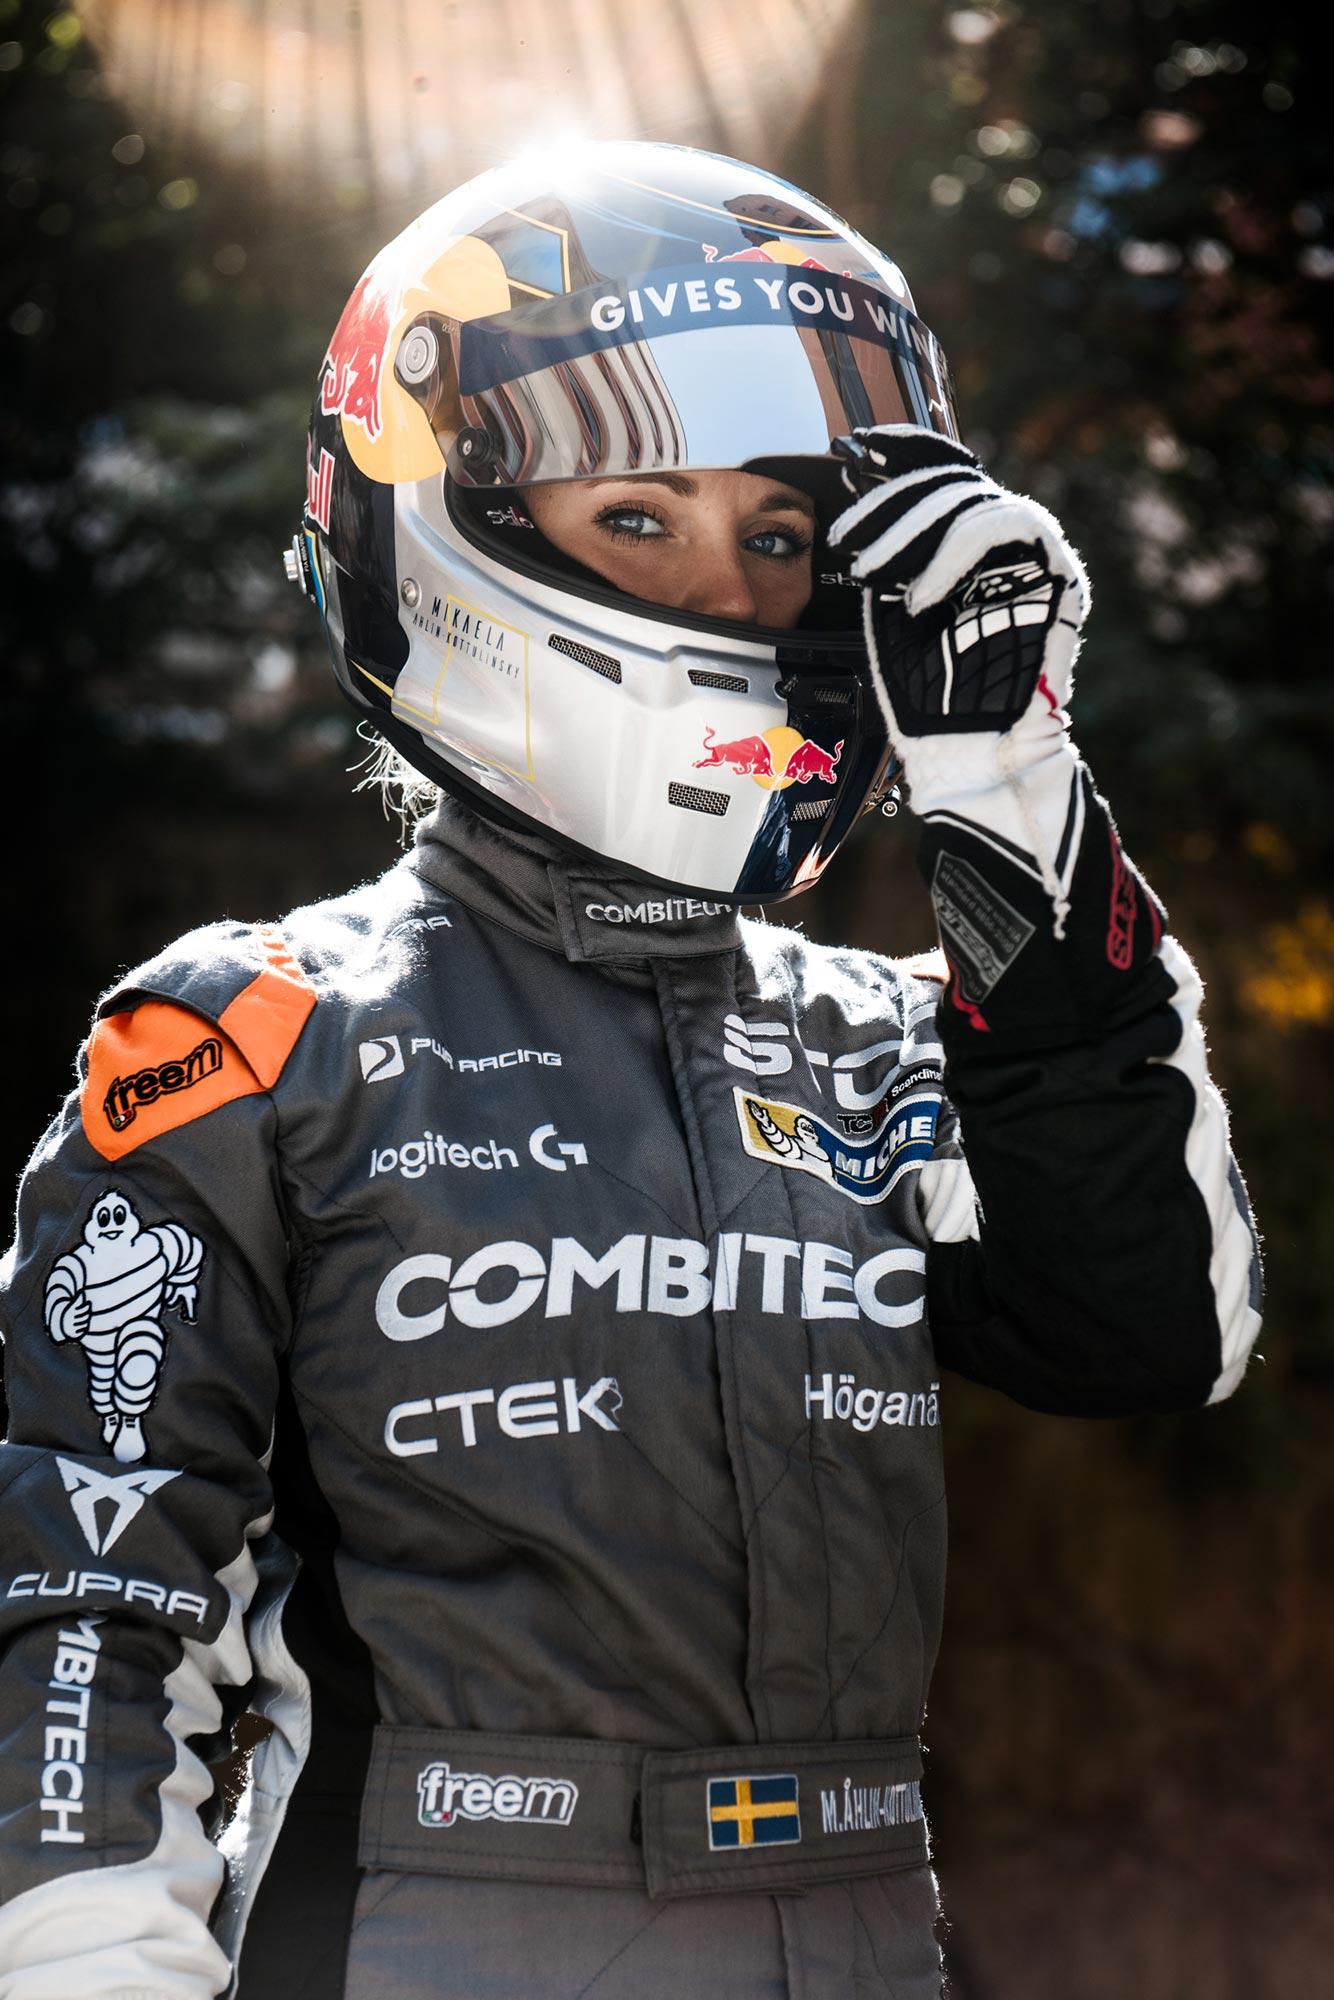 Red Bull – Mikaela Ahlin-Kottulinsky